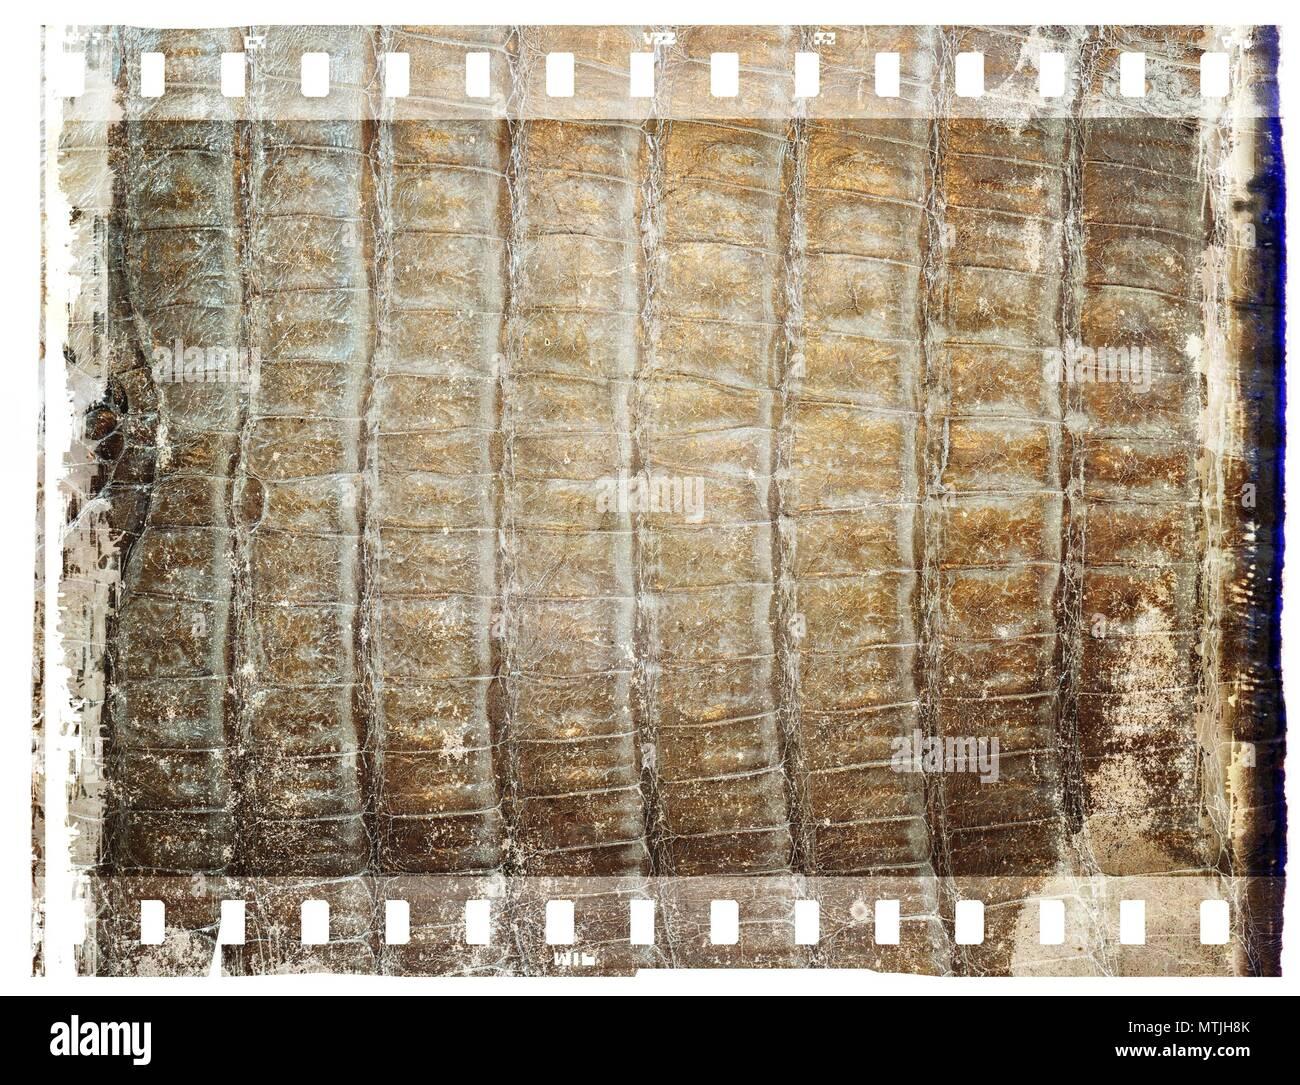 Cinema Art Stockfotos & Cinema Art Bilder - Seite 12 - Alamy